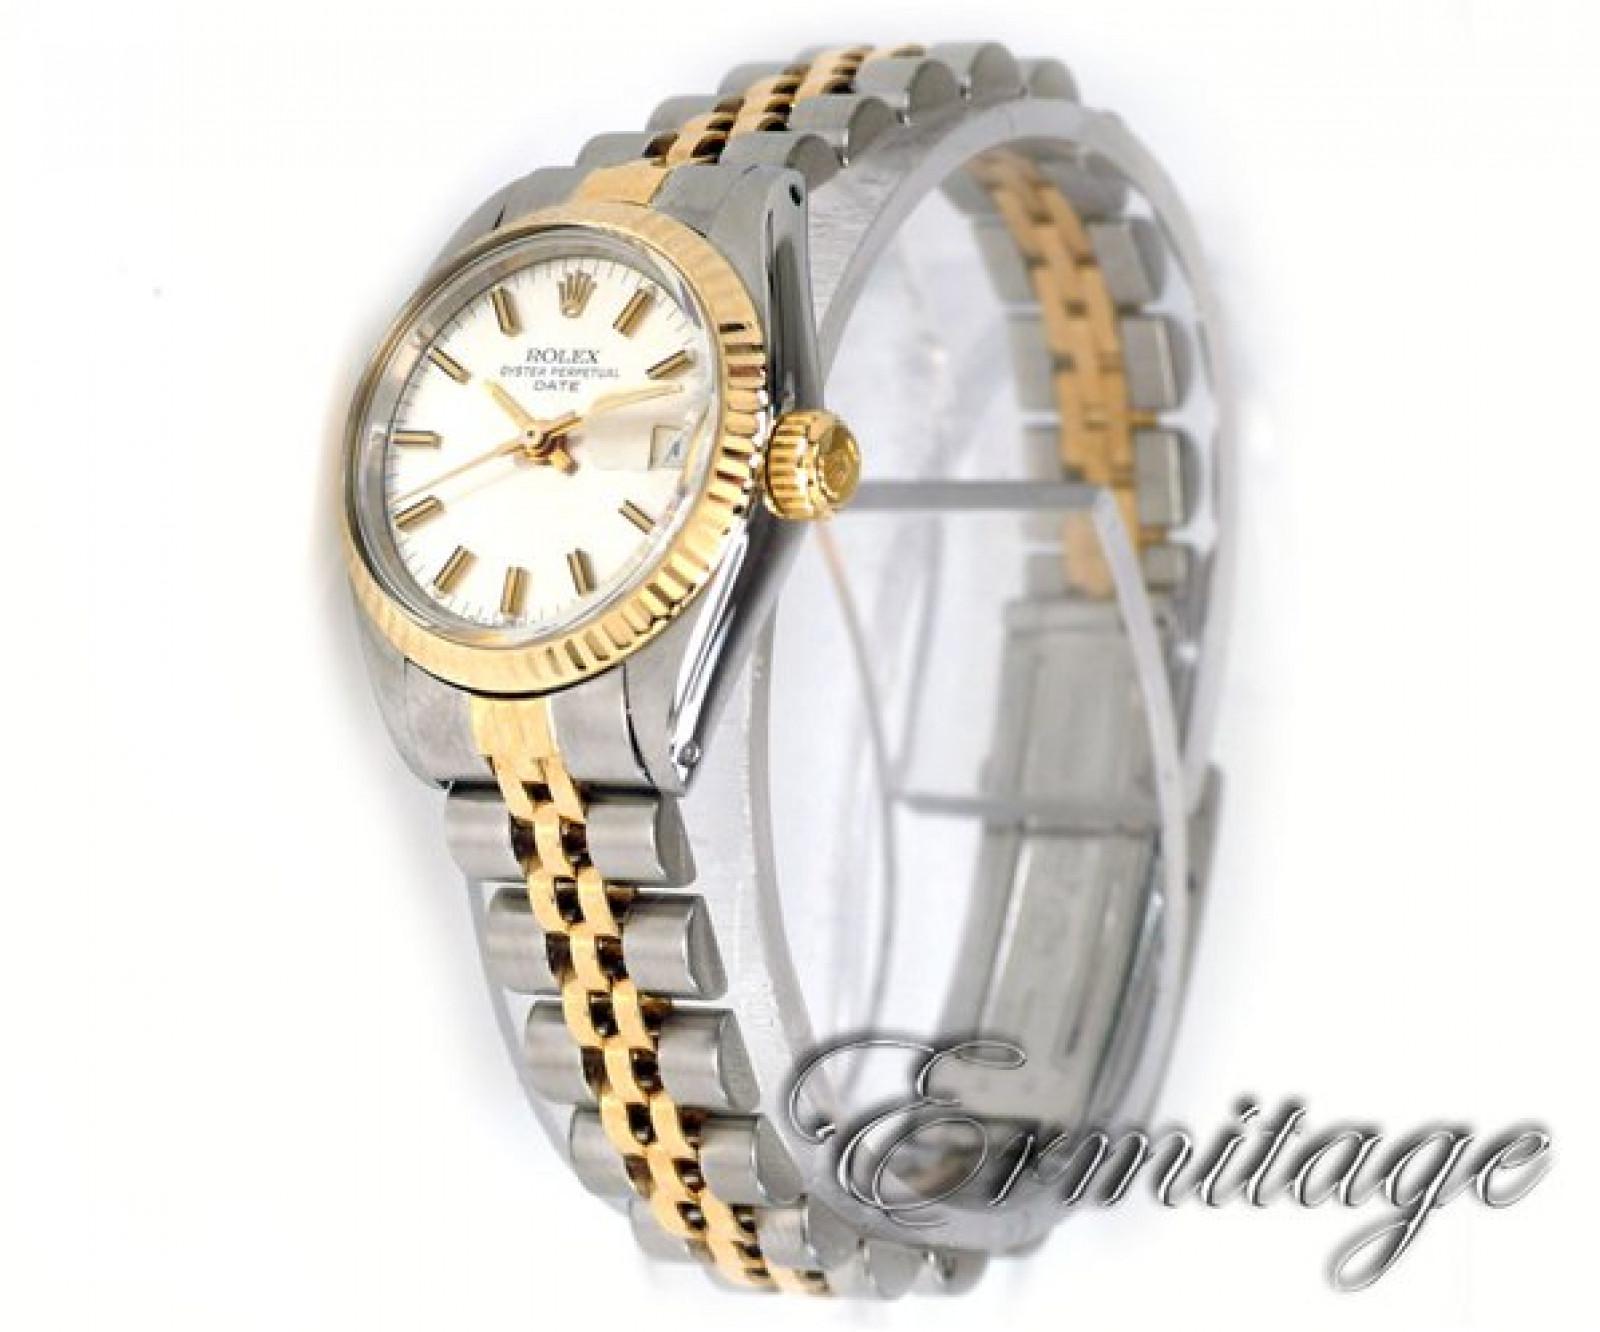 Vintage Rolex Date 6917 Gold & Steel